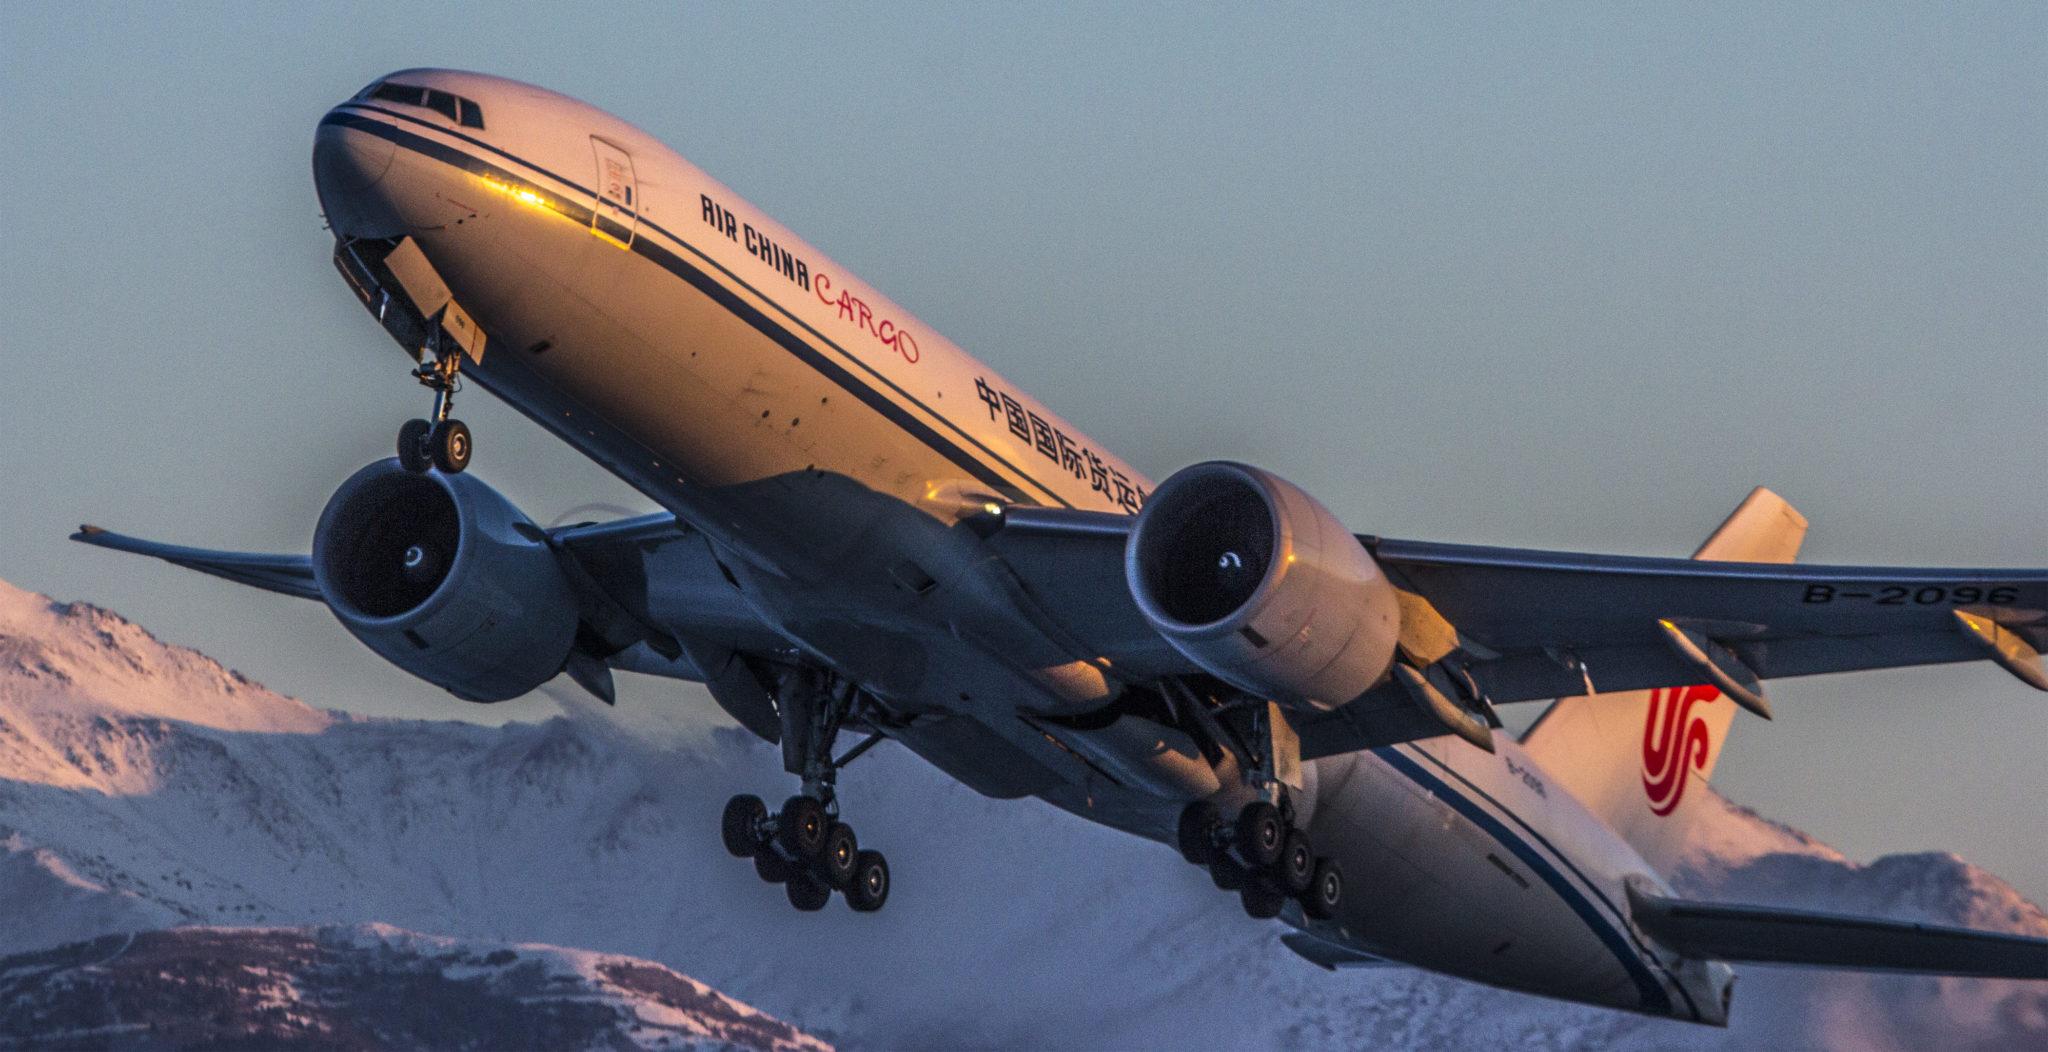 Alpine glow takeoff by Air China at ANC   Aircraft Portraits   Alaskafoto - read more!